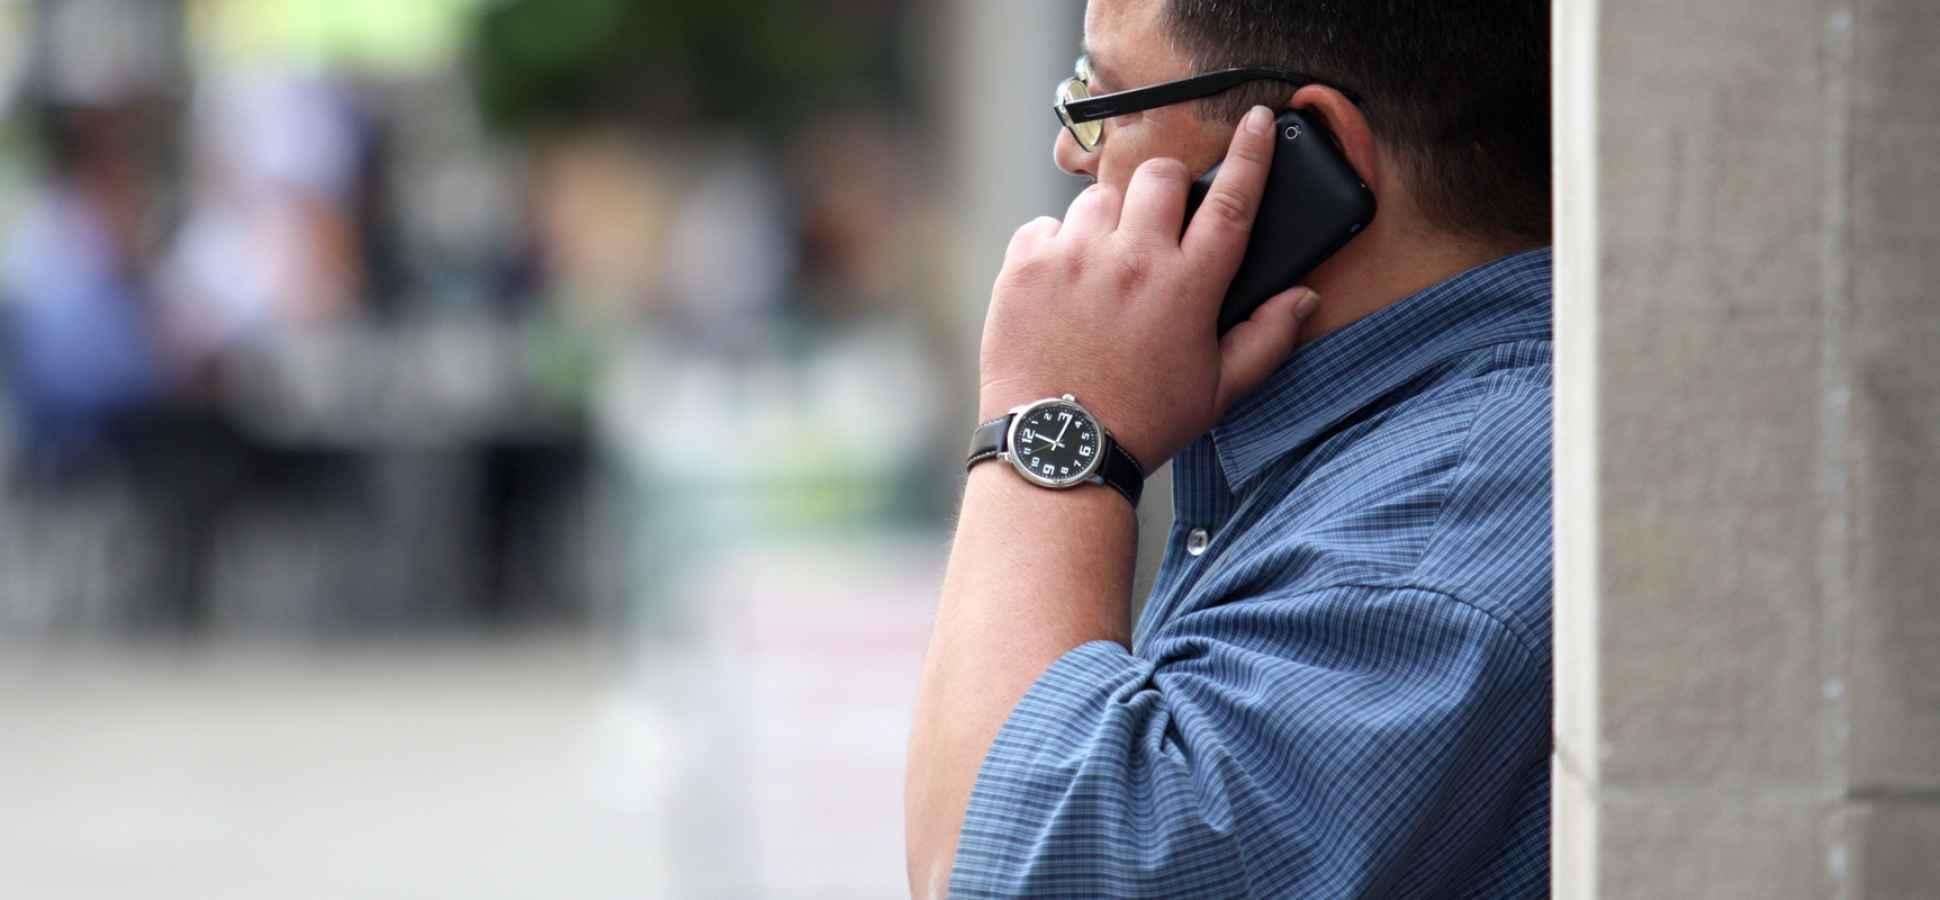 6 Ways to Make Smarter Cold Calls